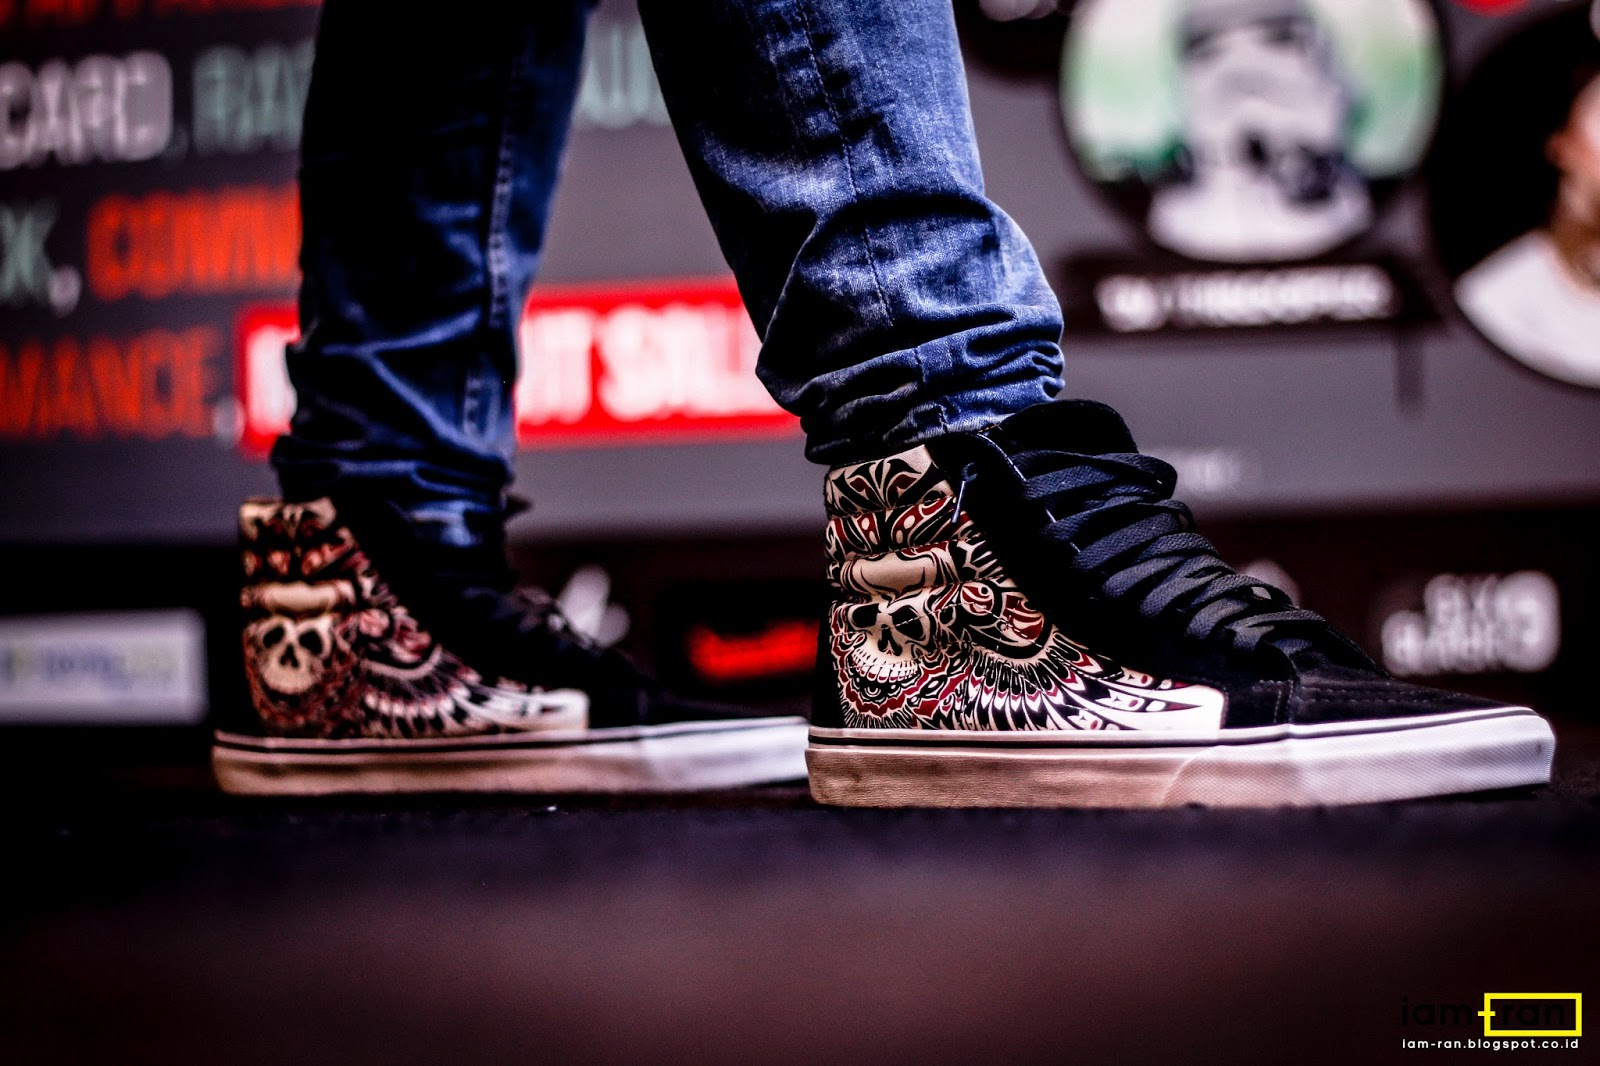 ON FEET   Ade - Vans SK8 hi skull machine. Ade on feet. Sneakers   Vans SK8  hi ... 6a1e526170